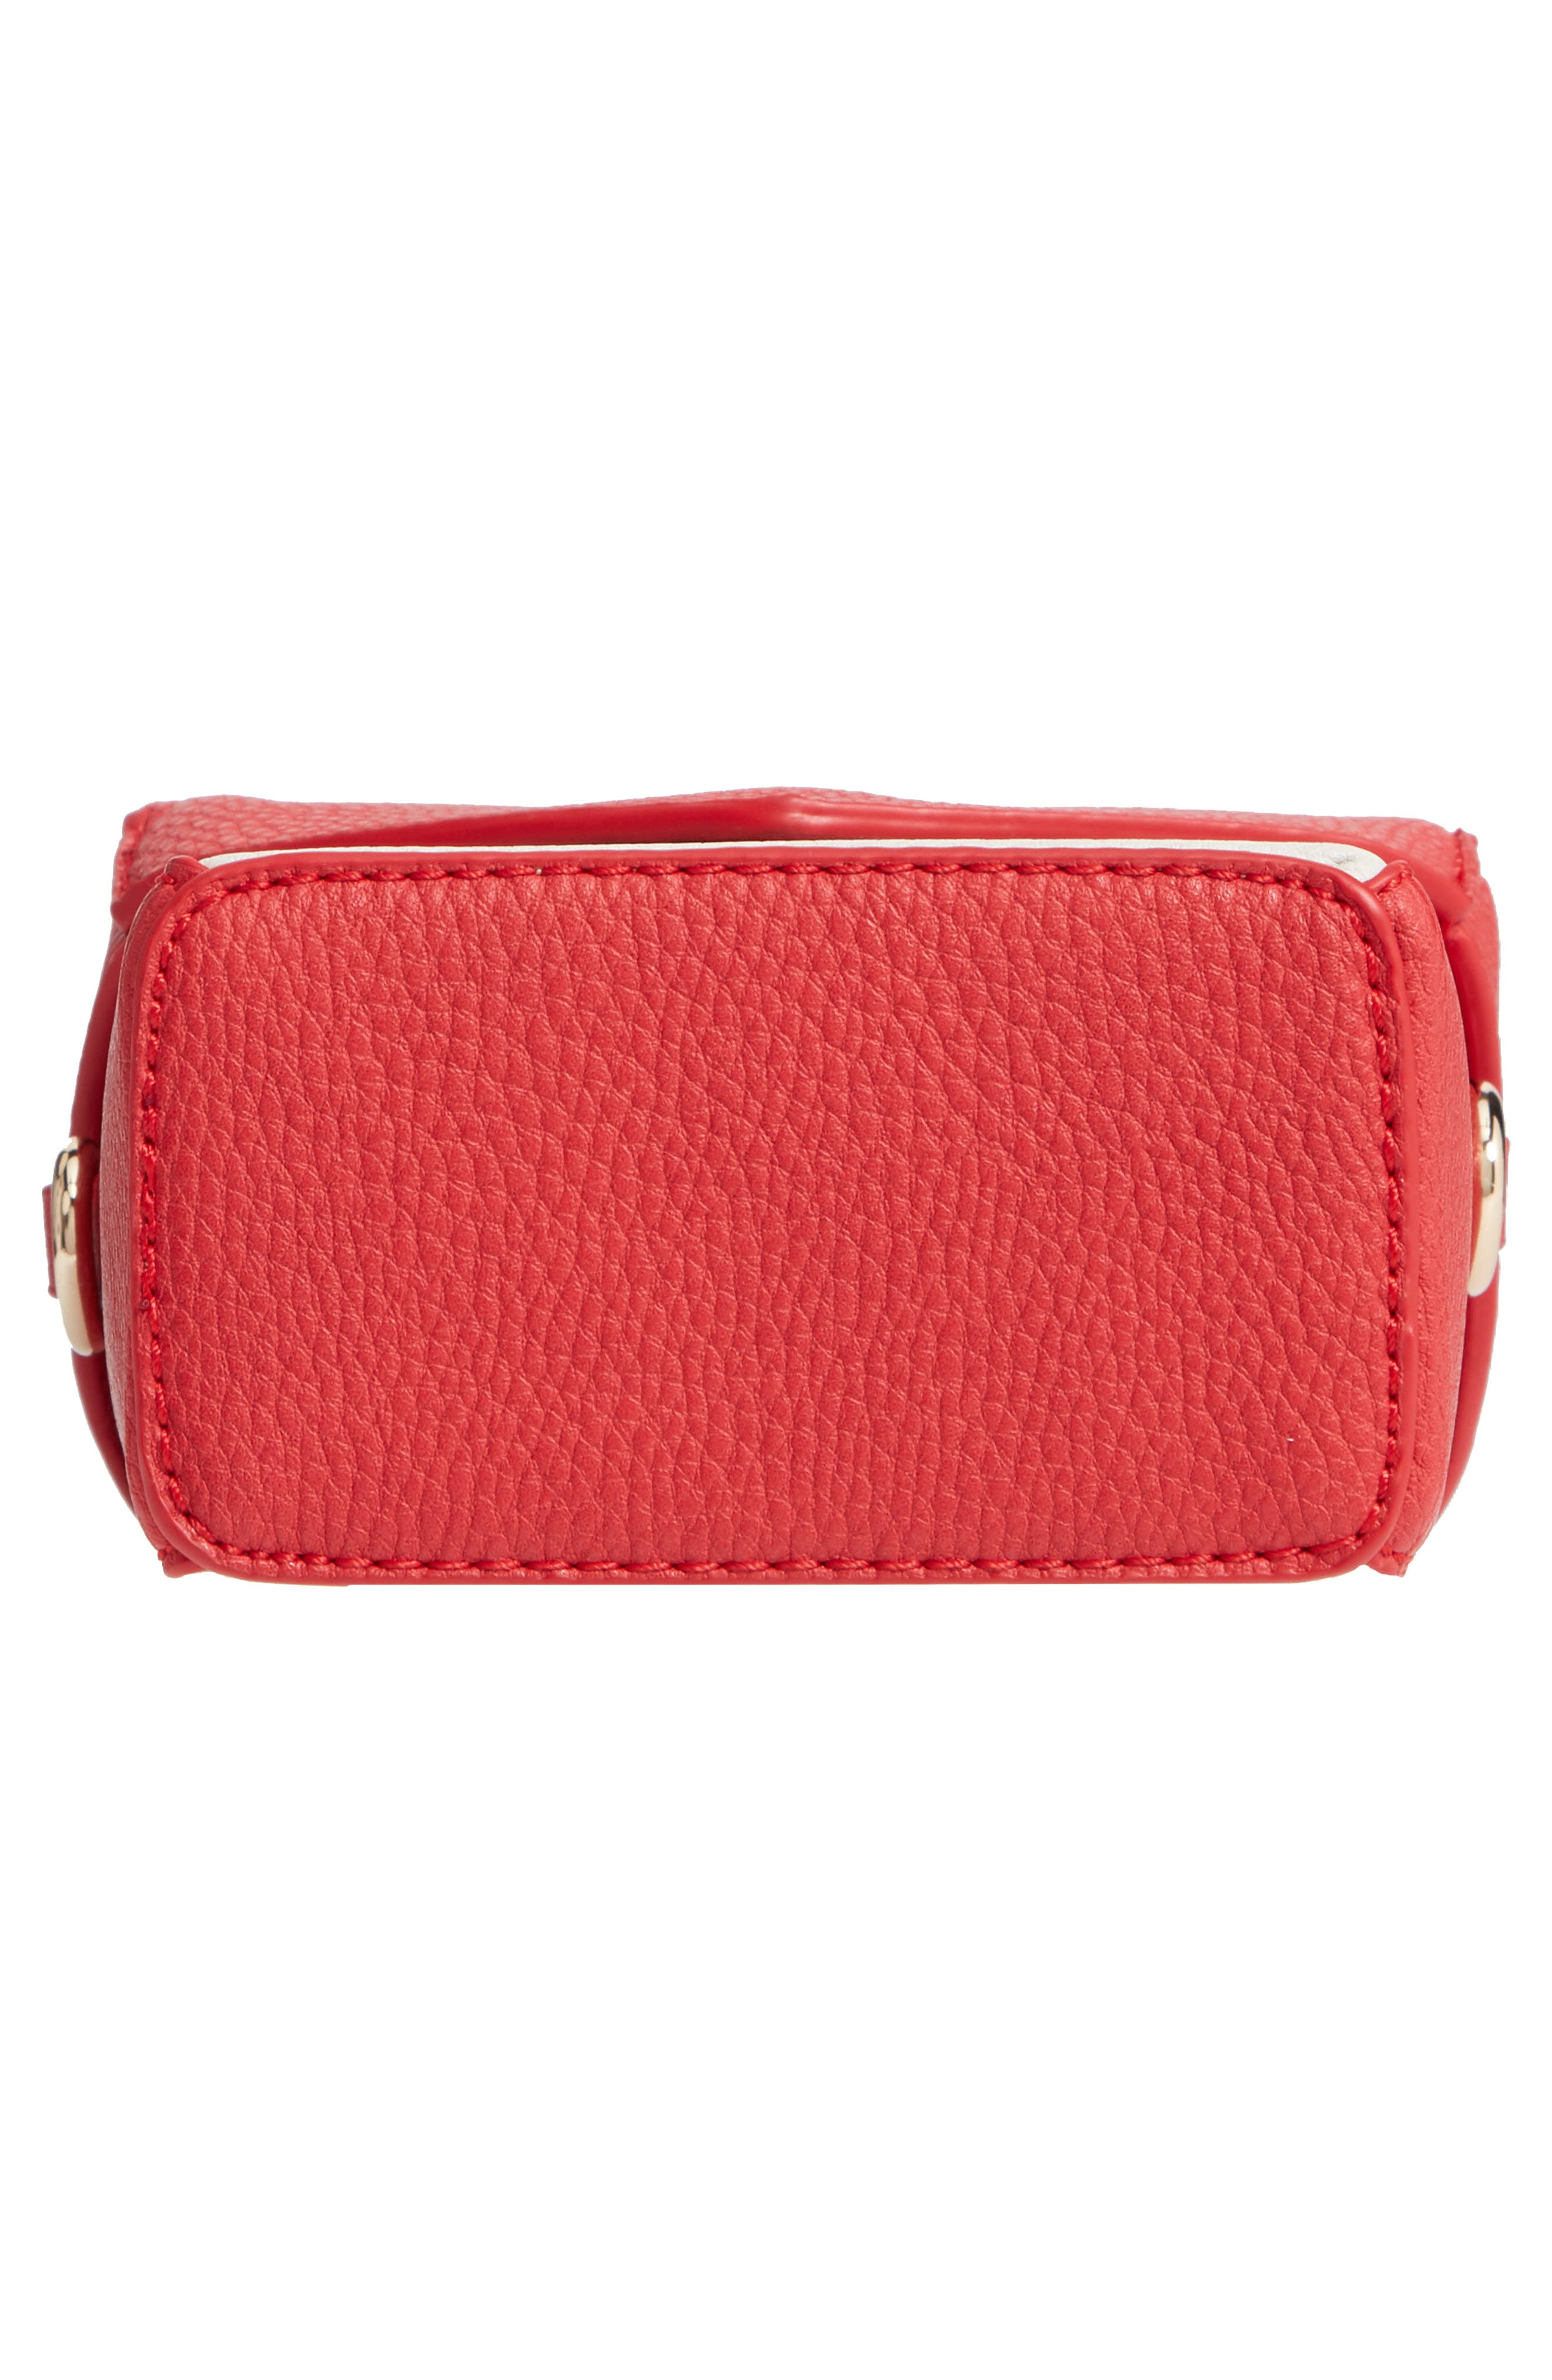 JULES KAE,                             Tabitha Faux Leather Crossbody Bag,                             Alternate thumbnail 6, color,                             100